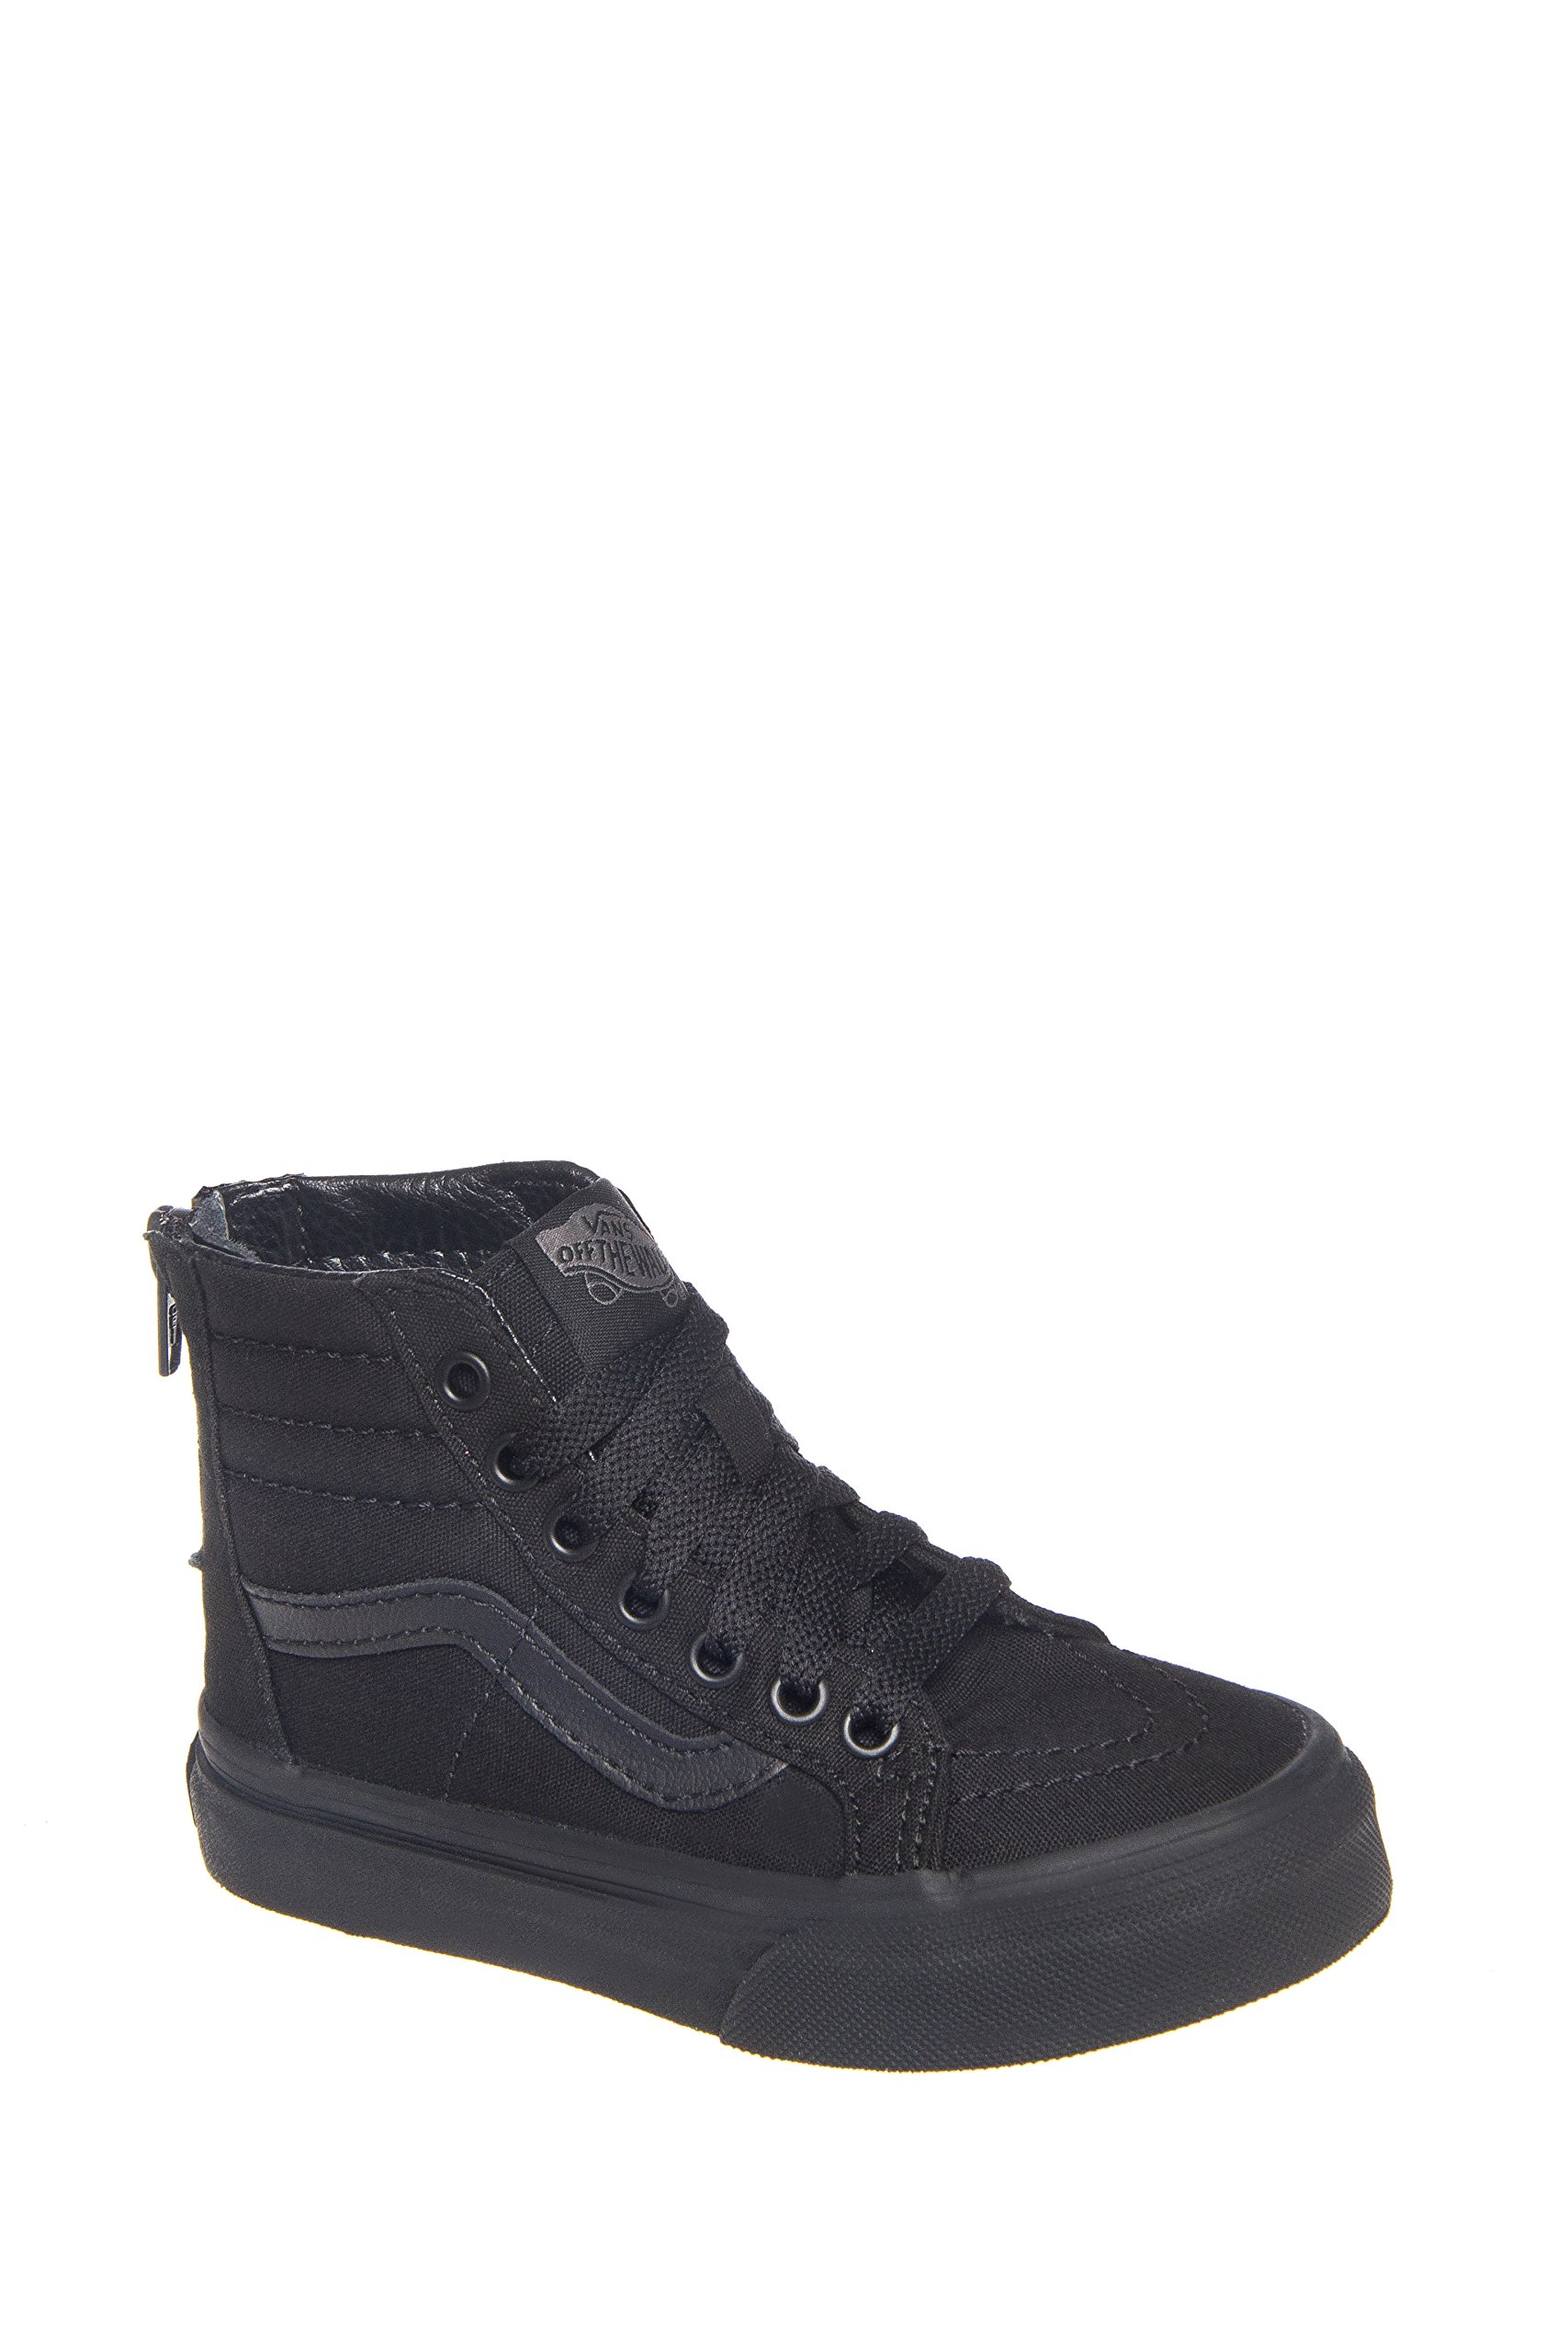 Vans Kids SK8 HI-Zip (POP Check) Shoes Black Black Size 2.5